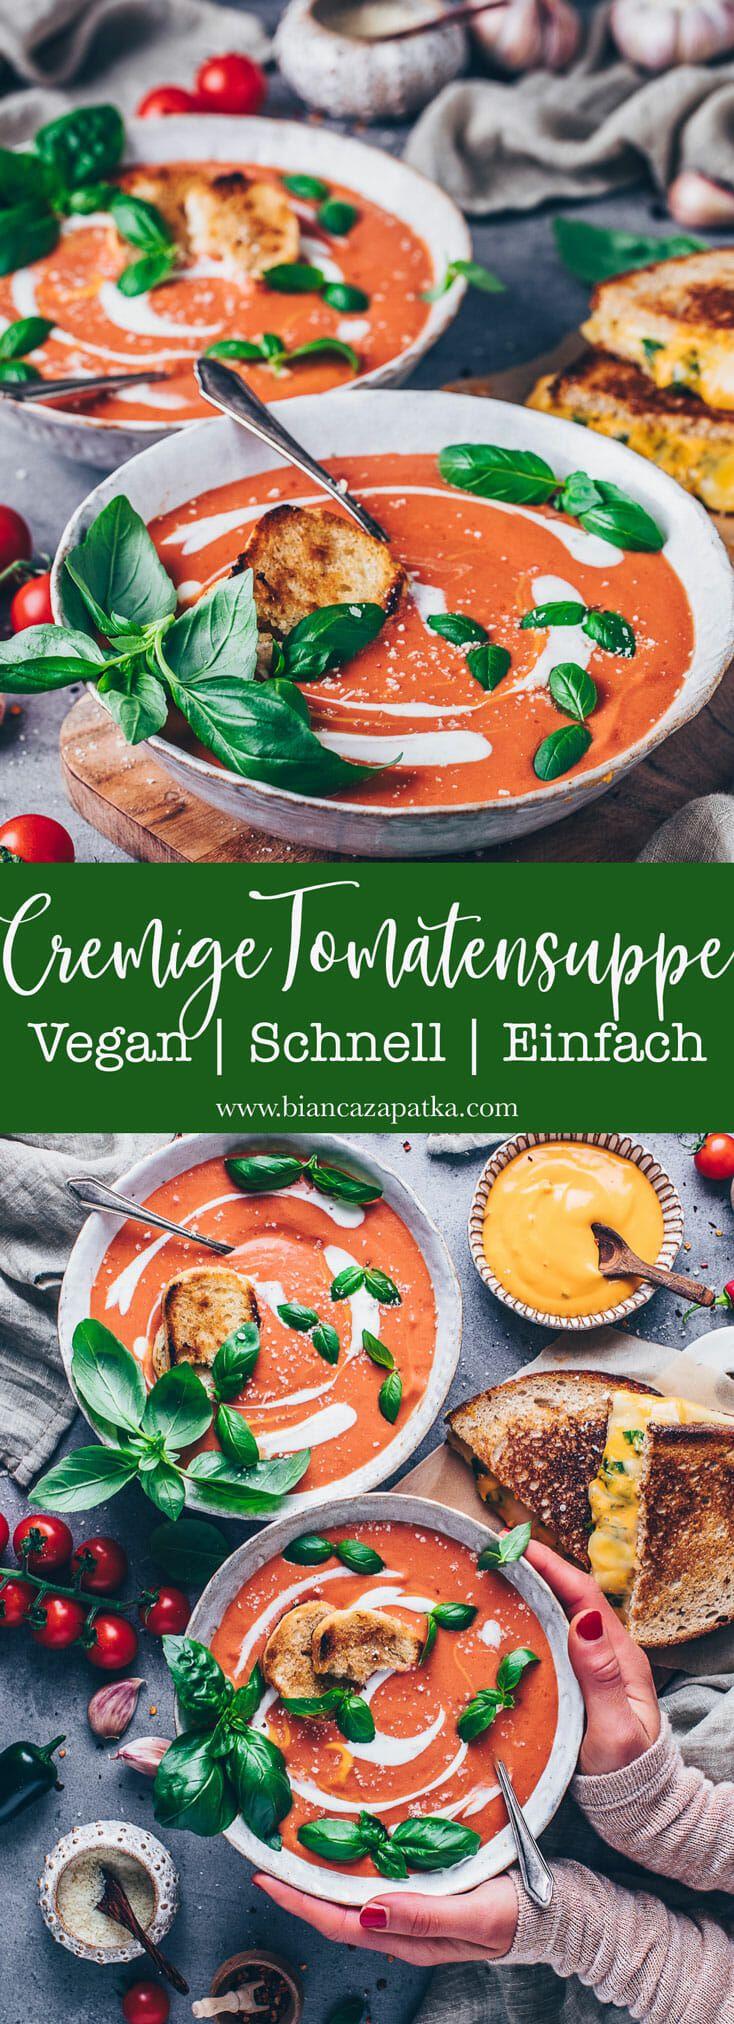 Cremige Tomatensuppe Rezept | Vegan, einfach – Bianca Zapatka | Rezepte